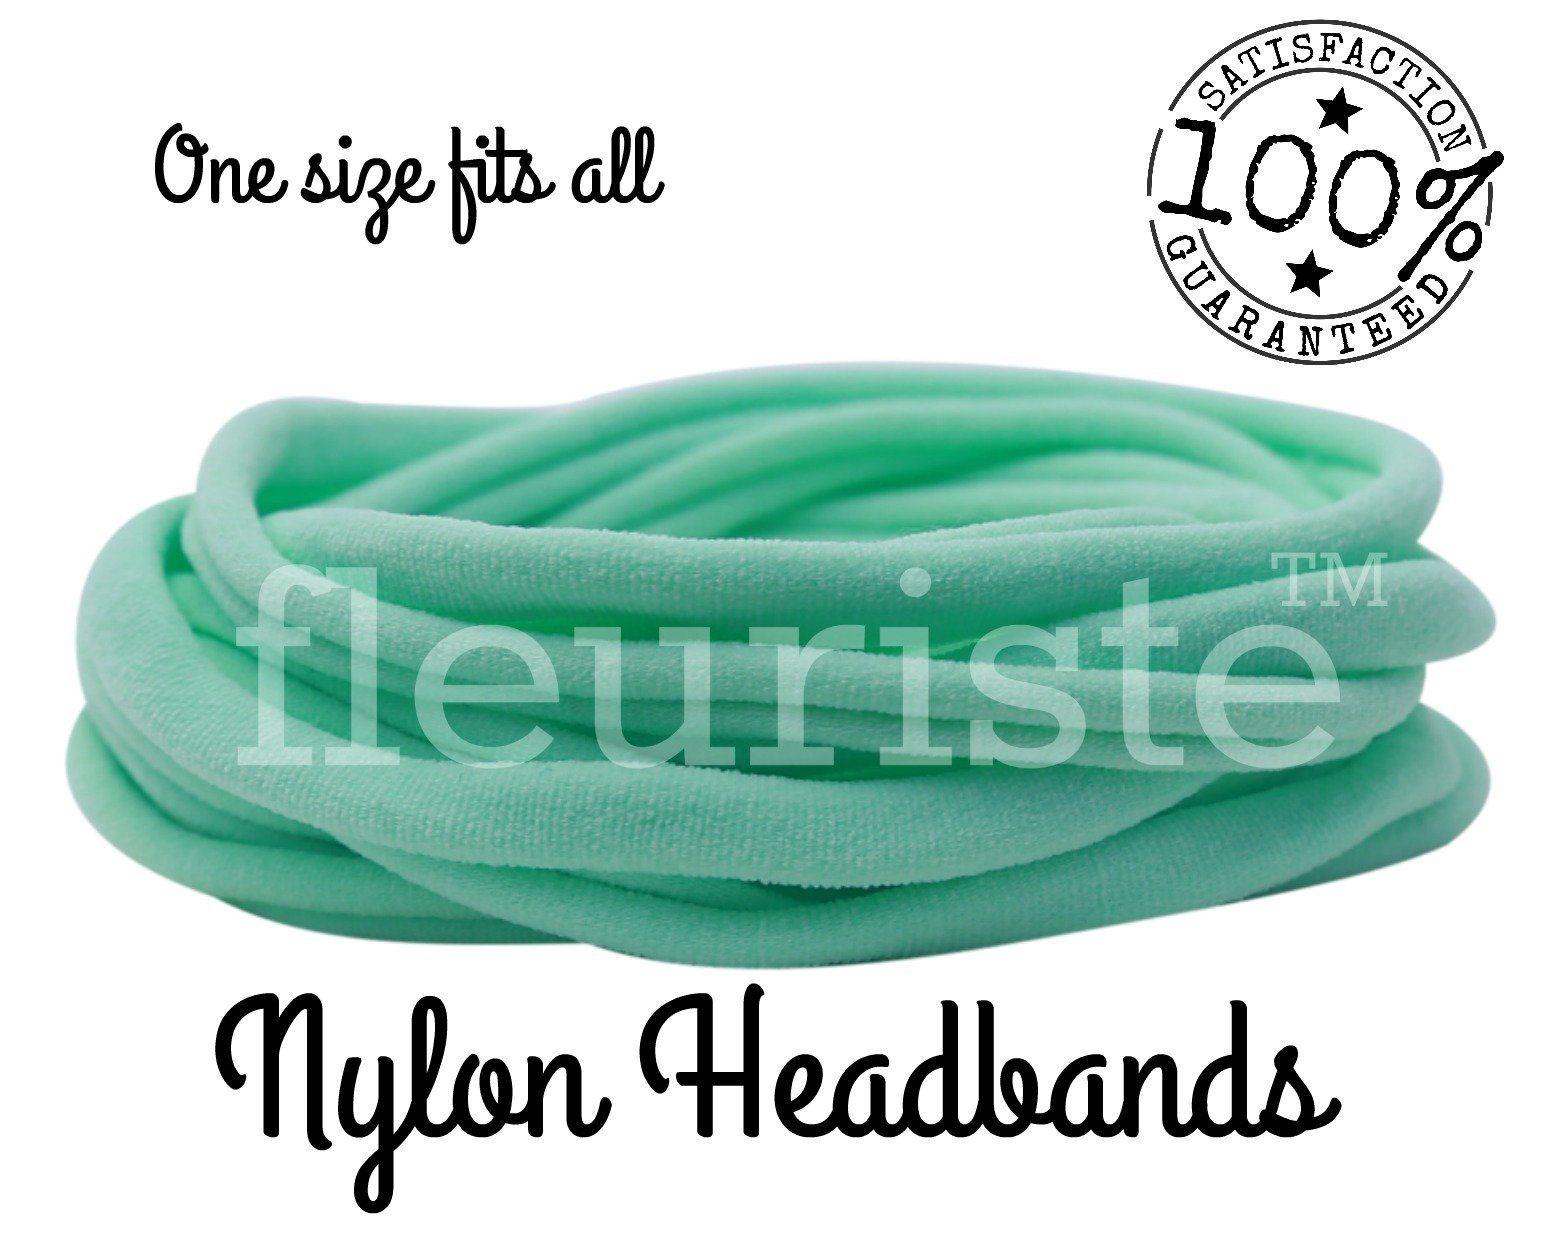 Mint Nylon headbands wholesale 39d4f9275cb